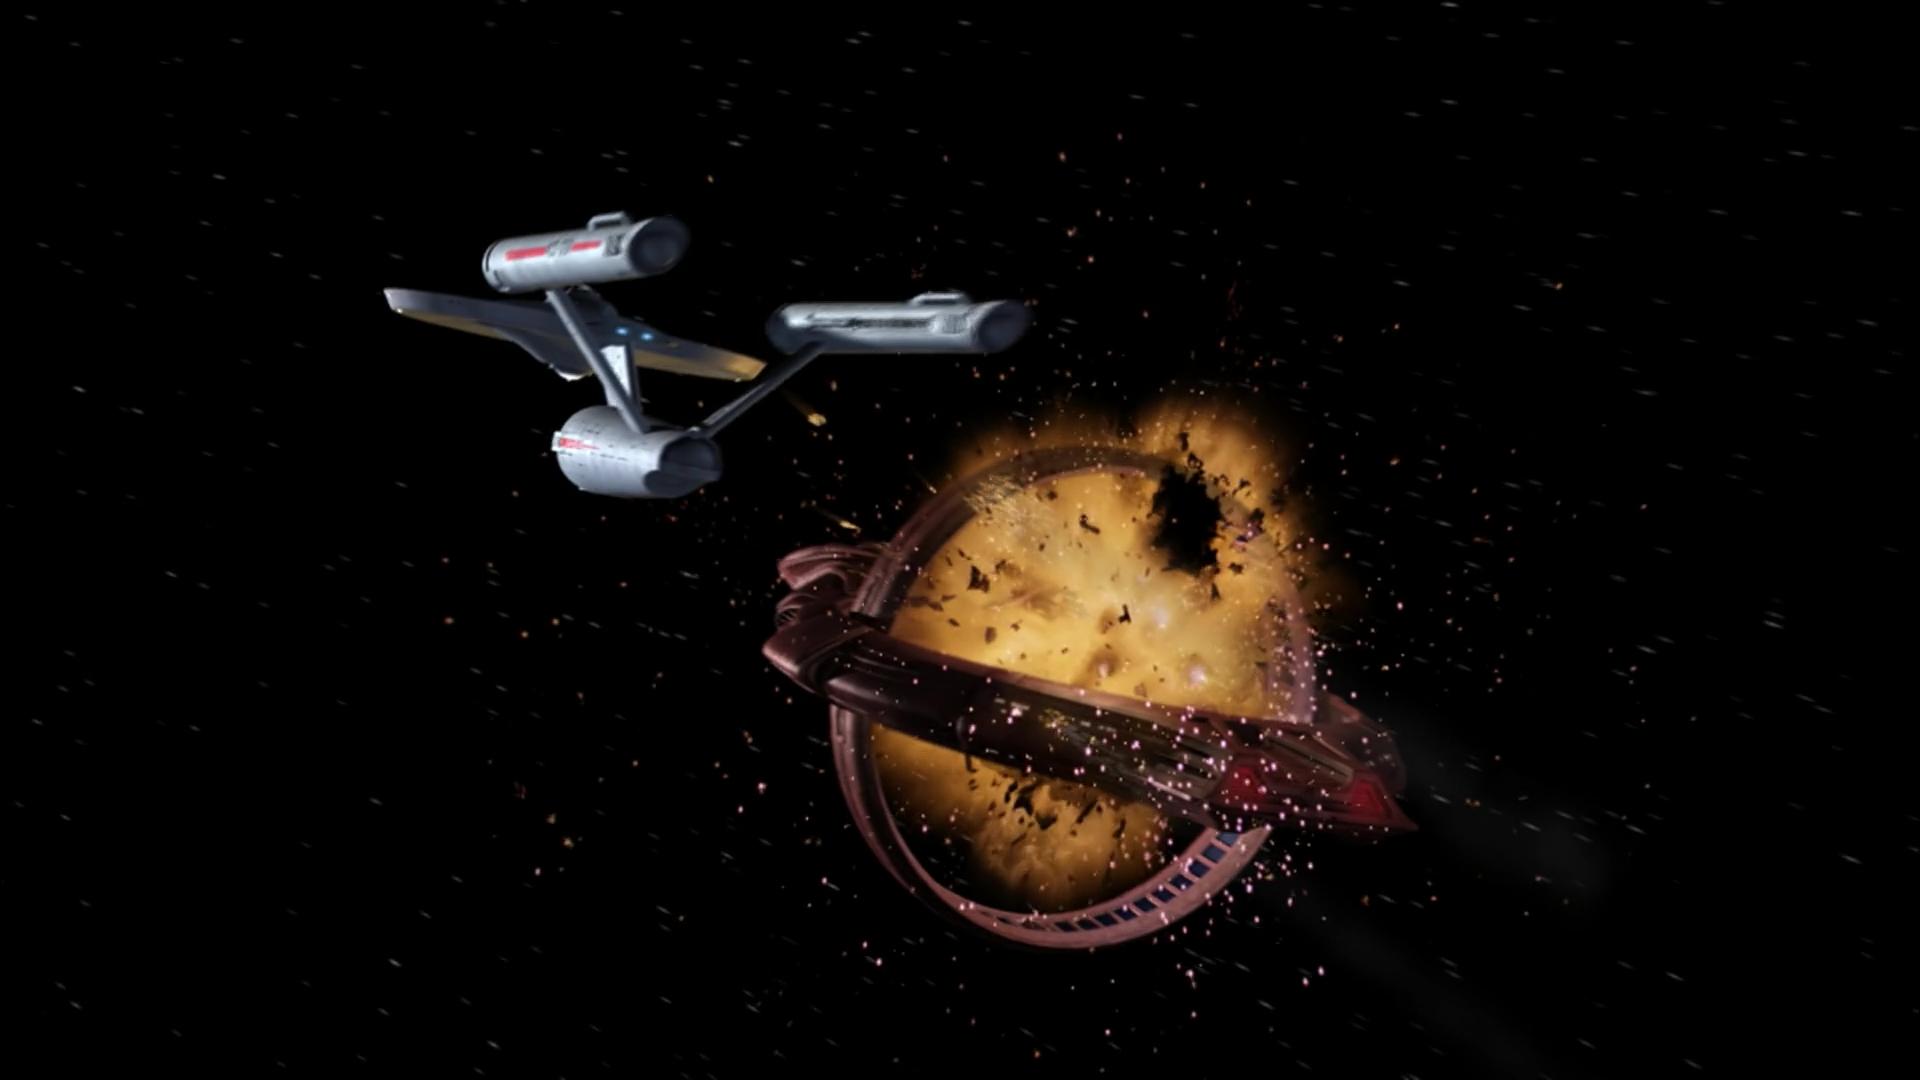 Uss Defiant Ncc 1764 Memory Alpha The Star Trek Wiki